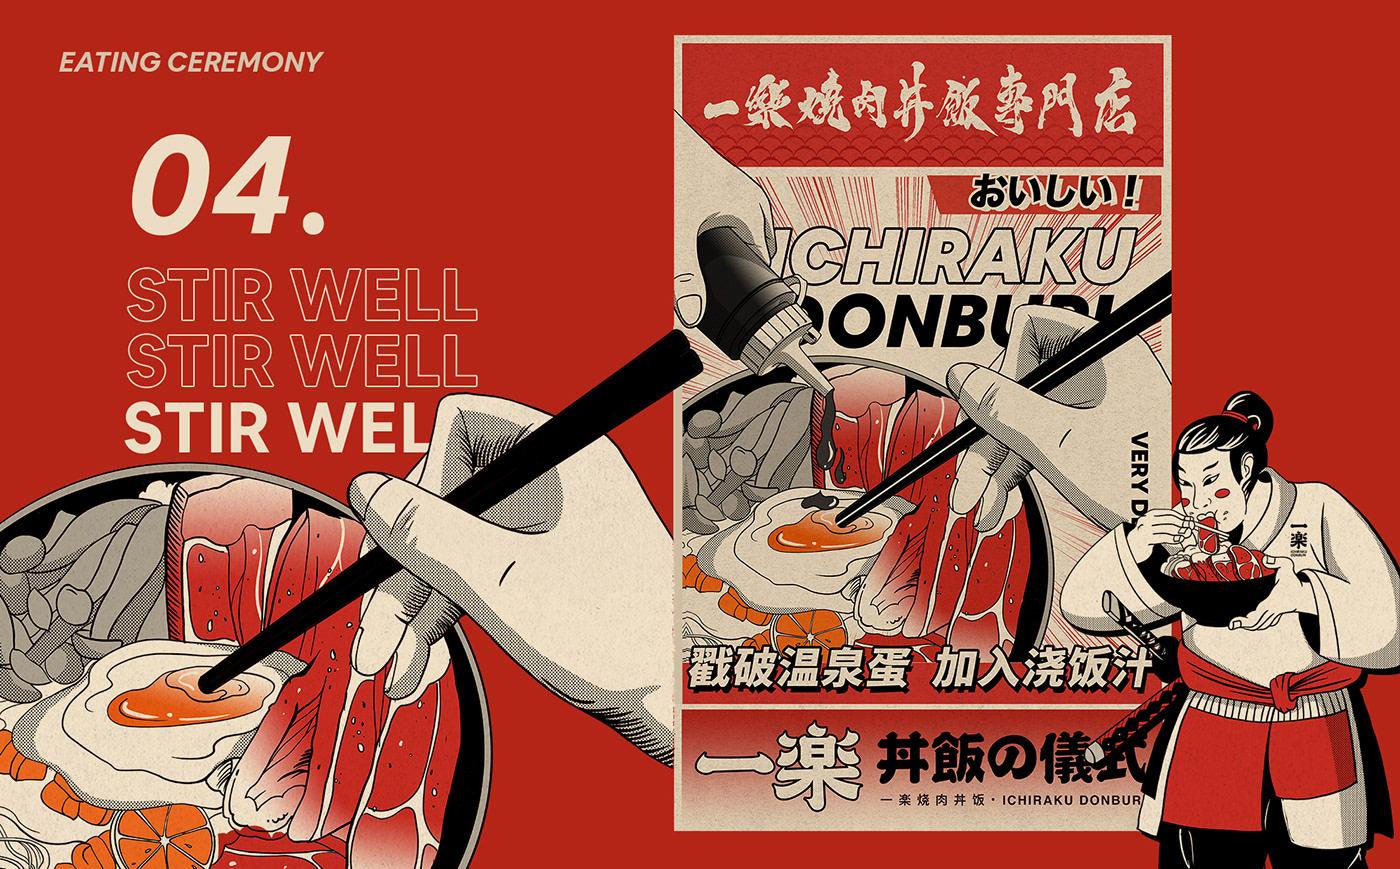 branding ,Character design ,graphic design ,Japanese Restaurant,logo,poster,Retro,VI,日式料理店,视觉系统